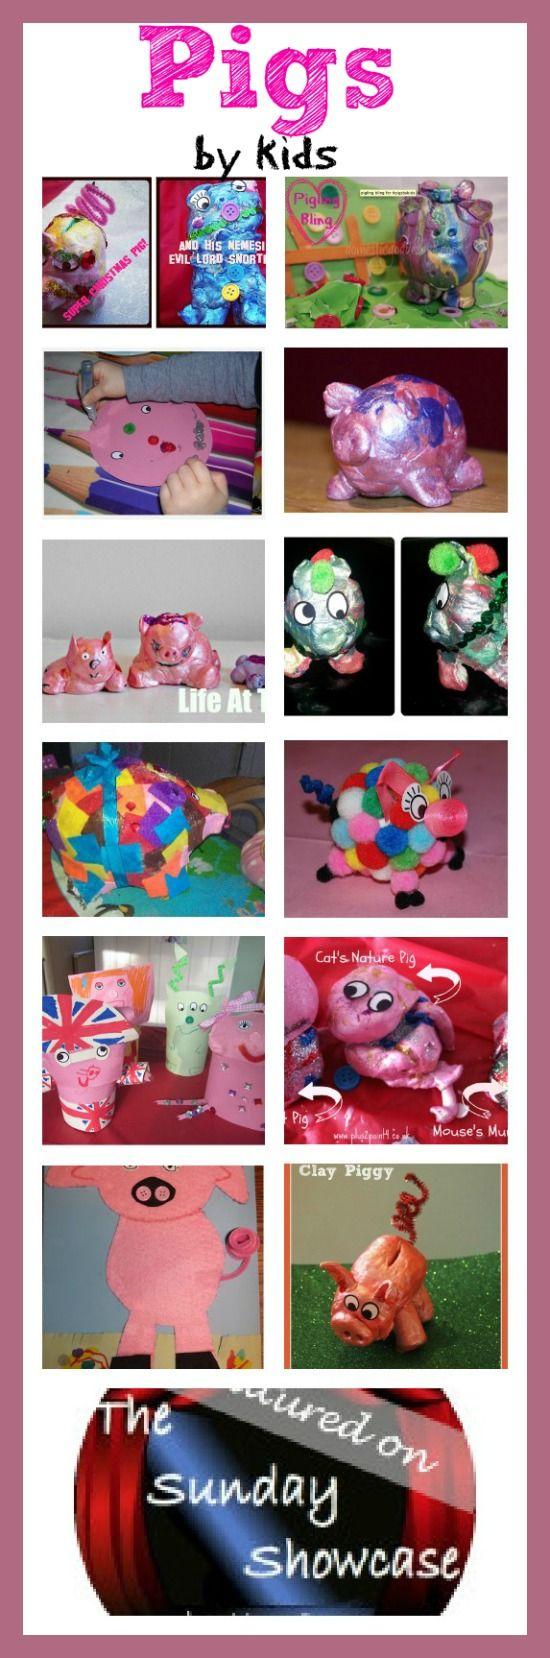 64 best three little pigs images on pinterest three little pigs